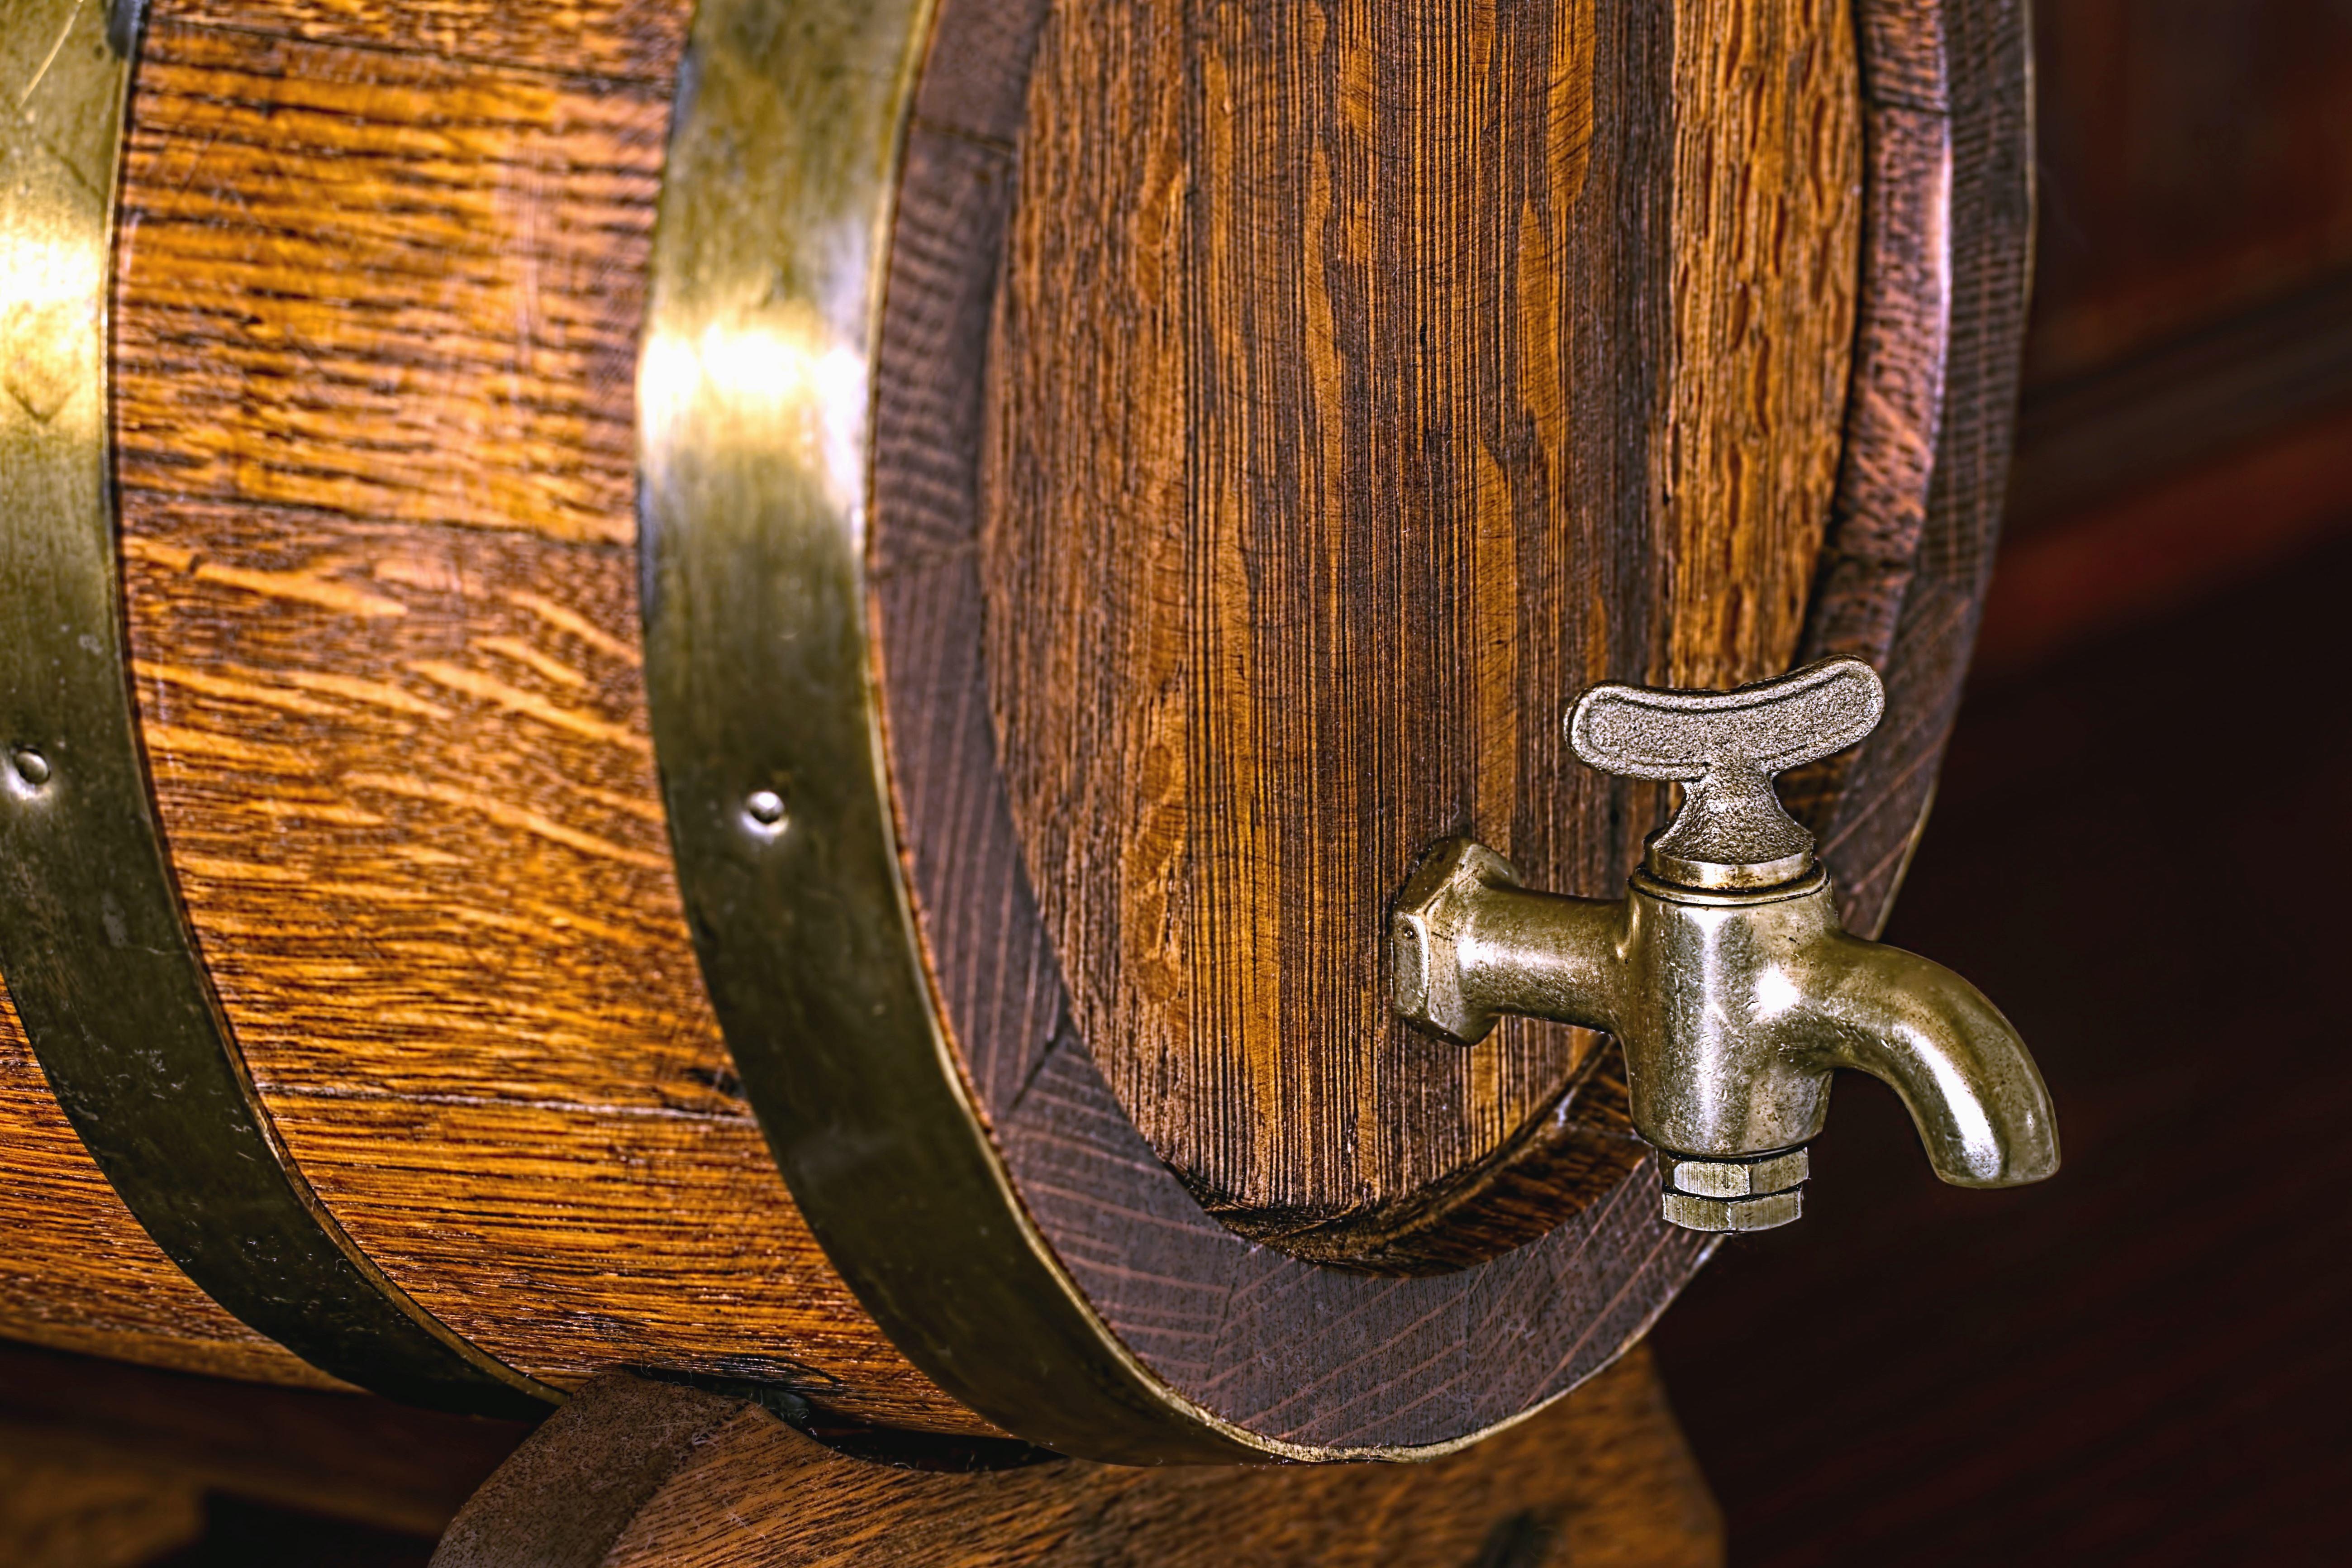 Free picture: barrel, faucet, wood, metal, hoop